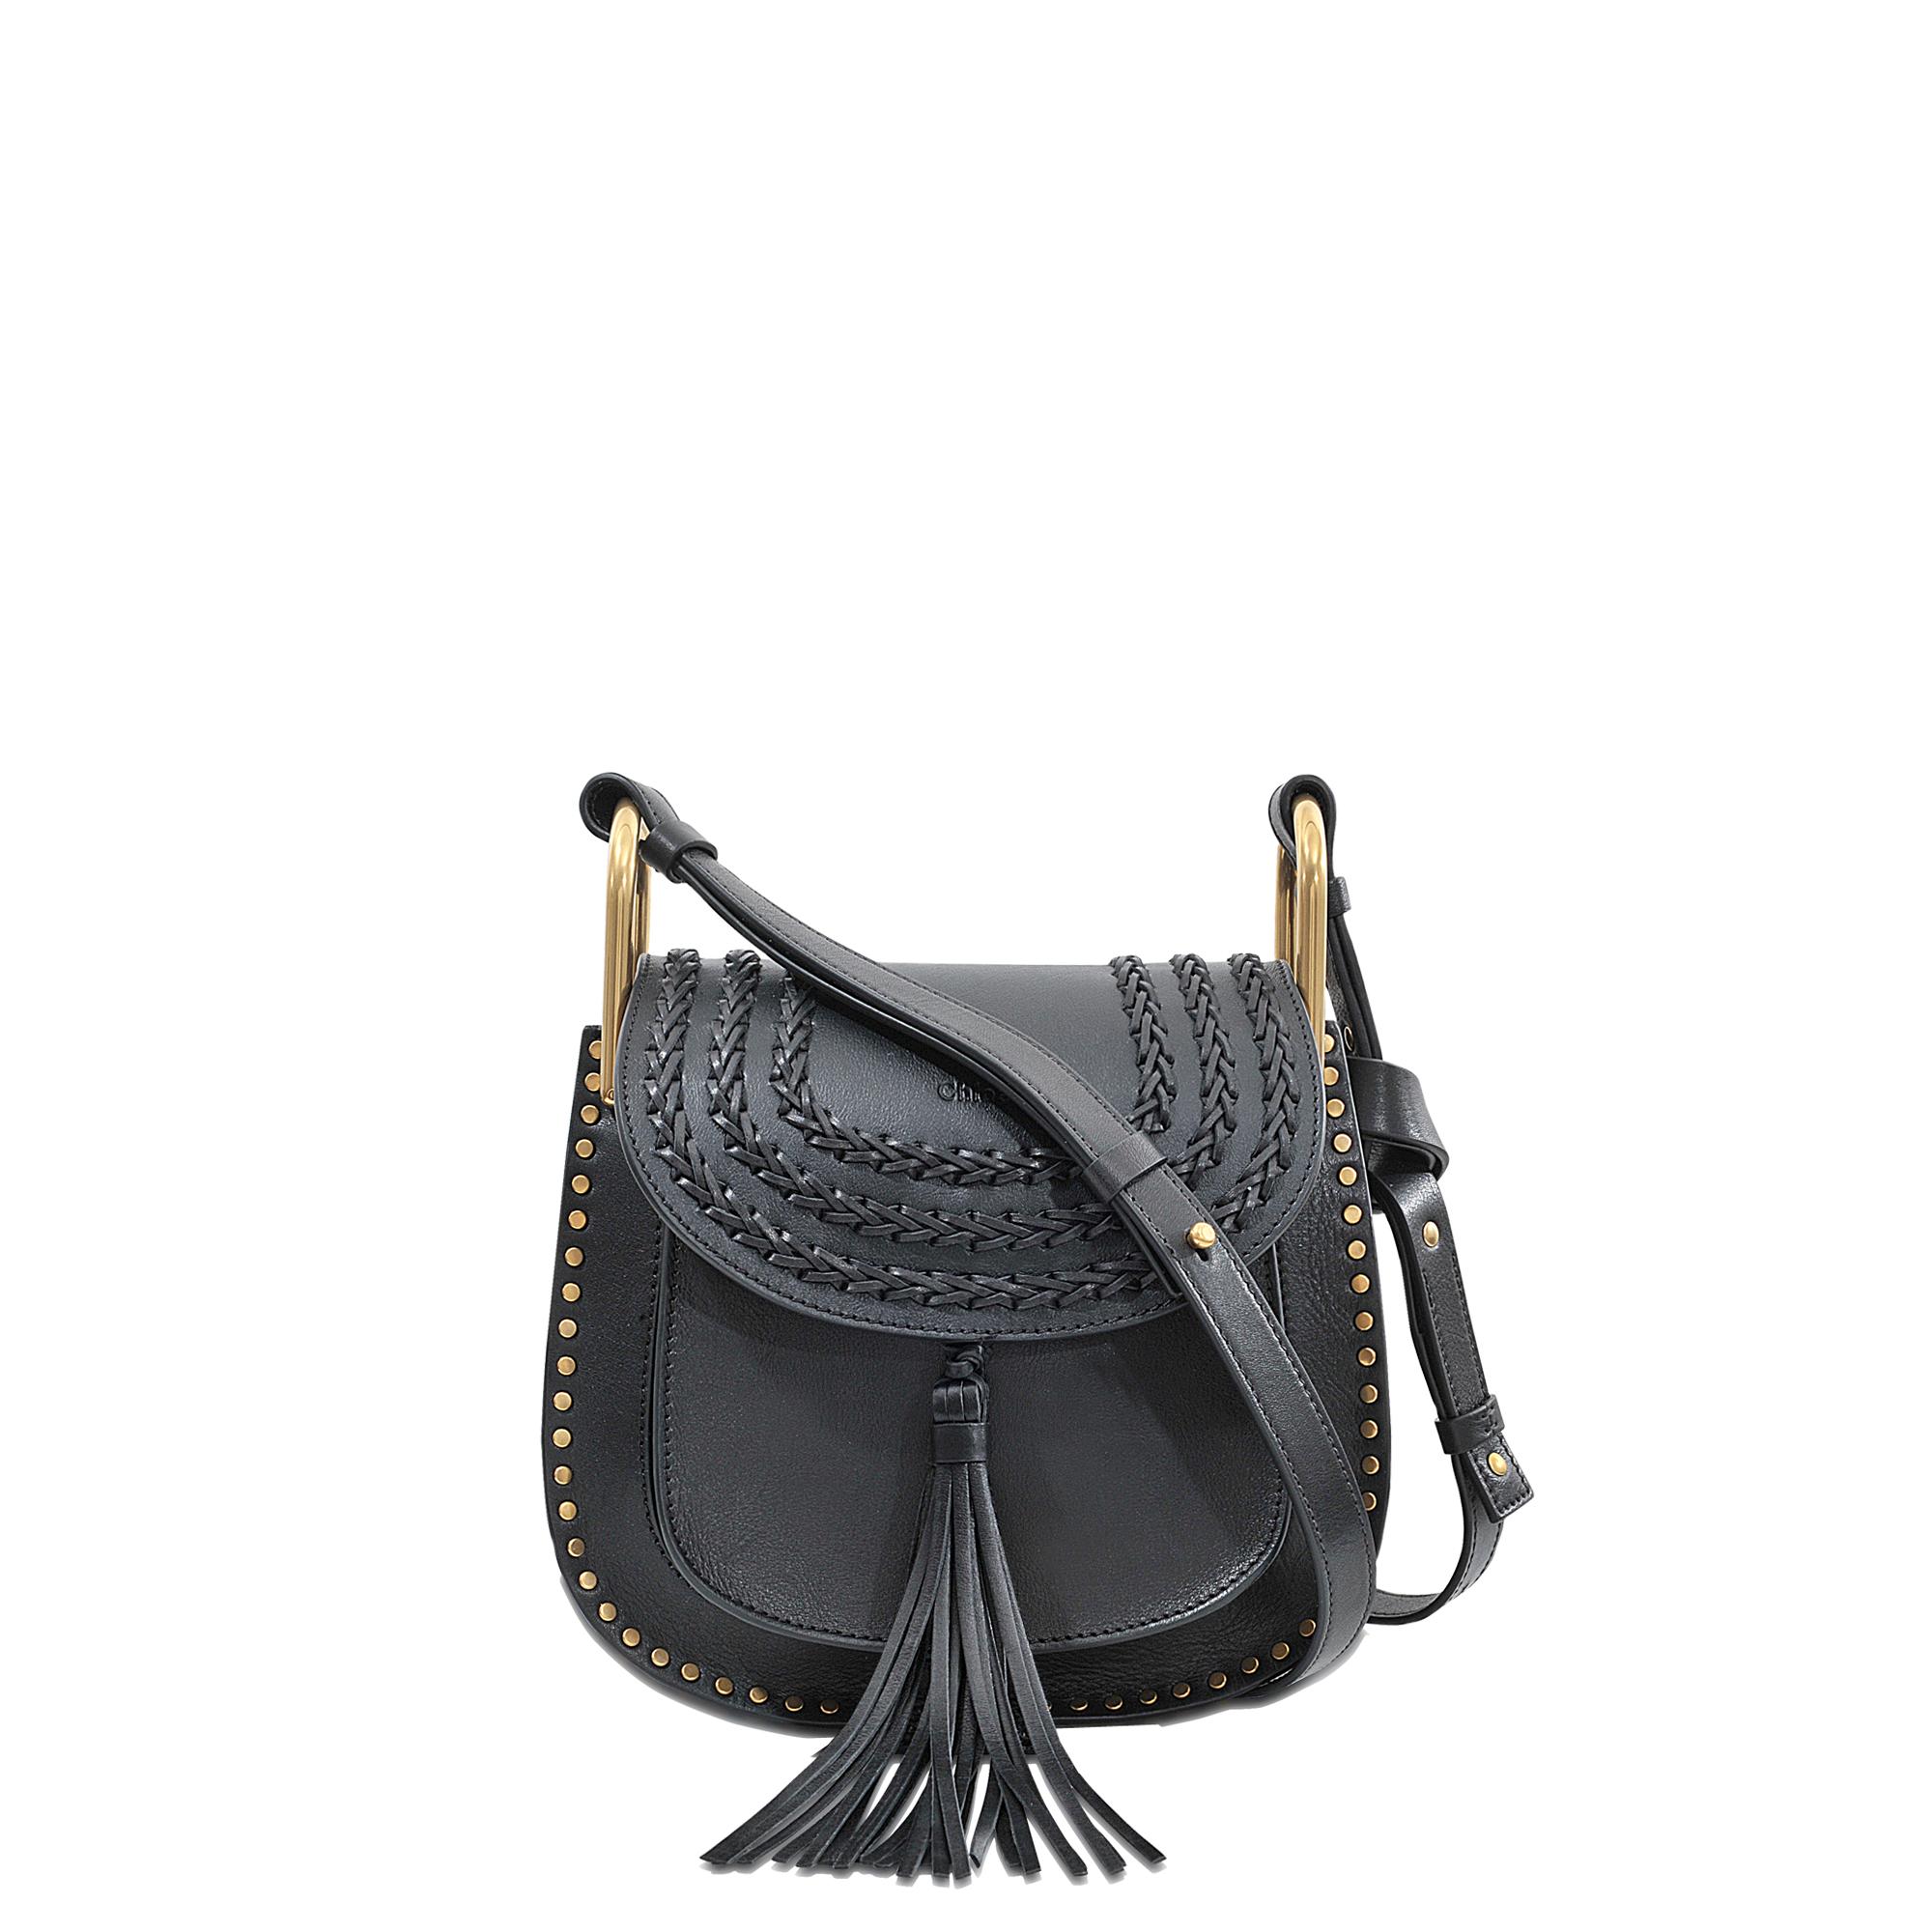 chloe marcie bag knockoff - Chlo�� Hudson Small Shoulder Bag in Gray | Lyst